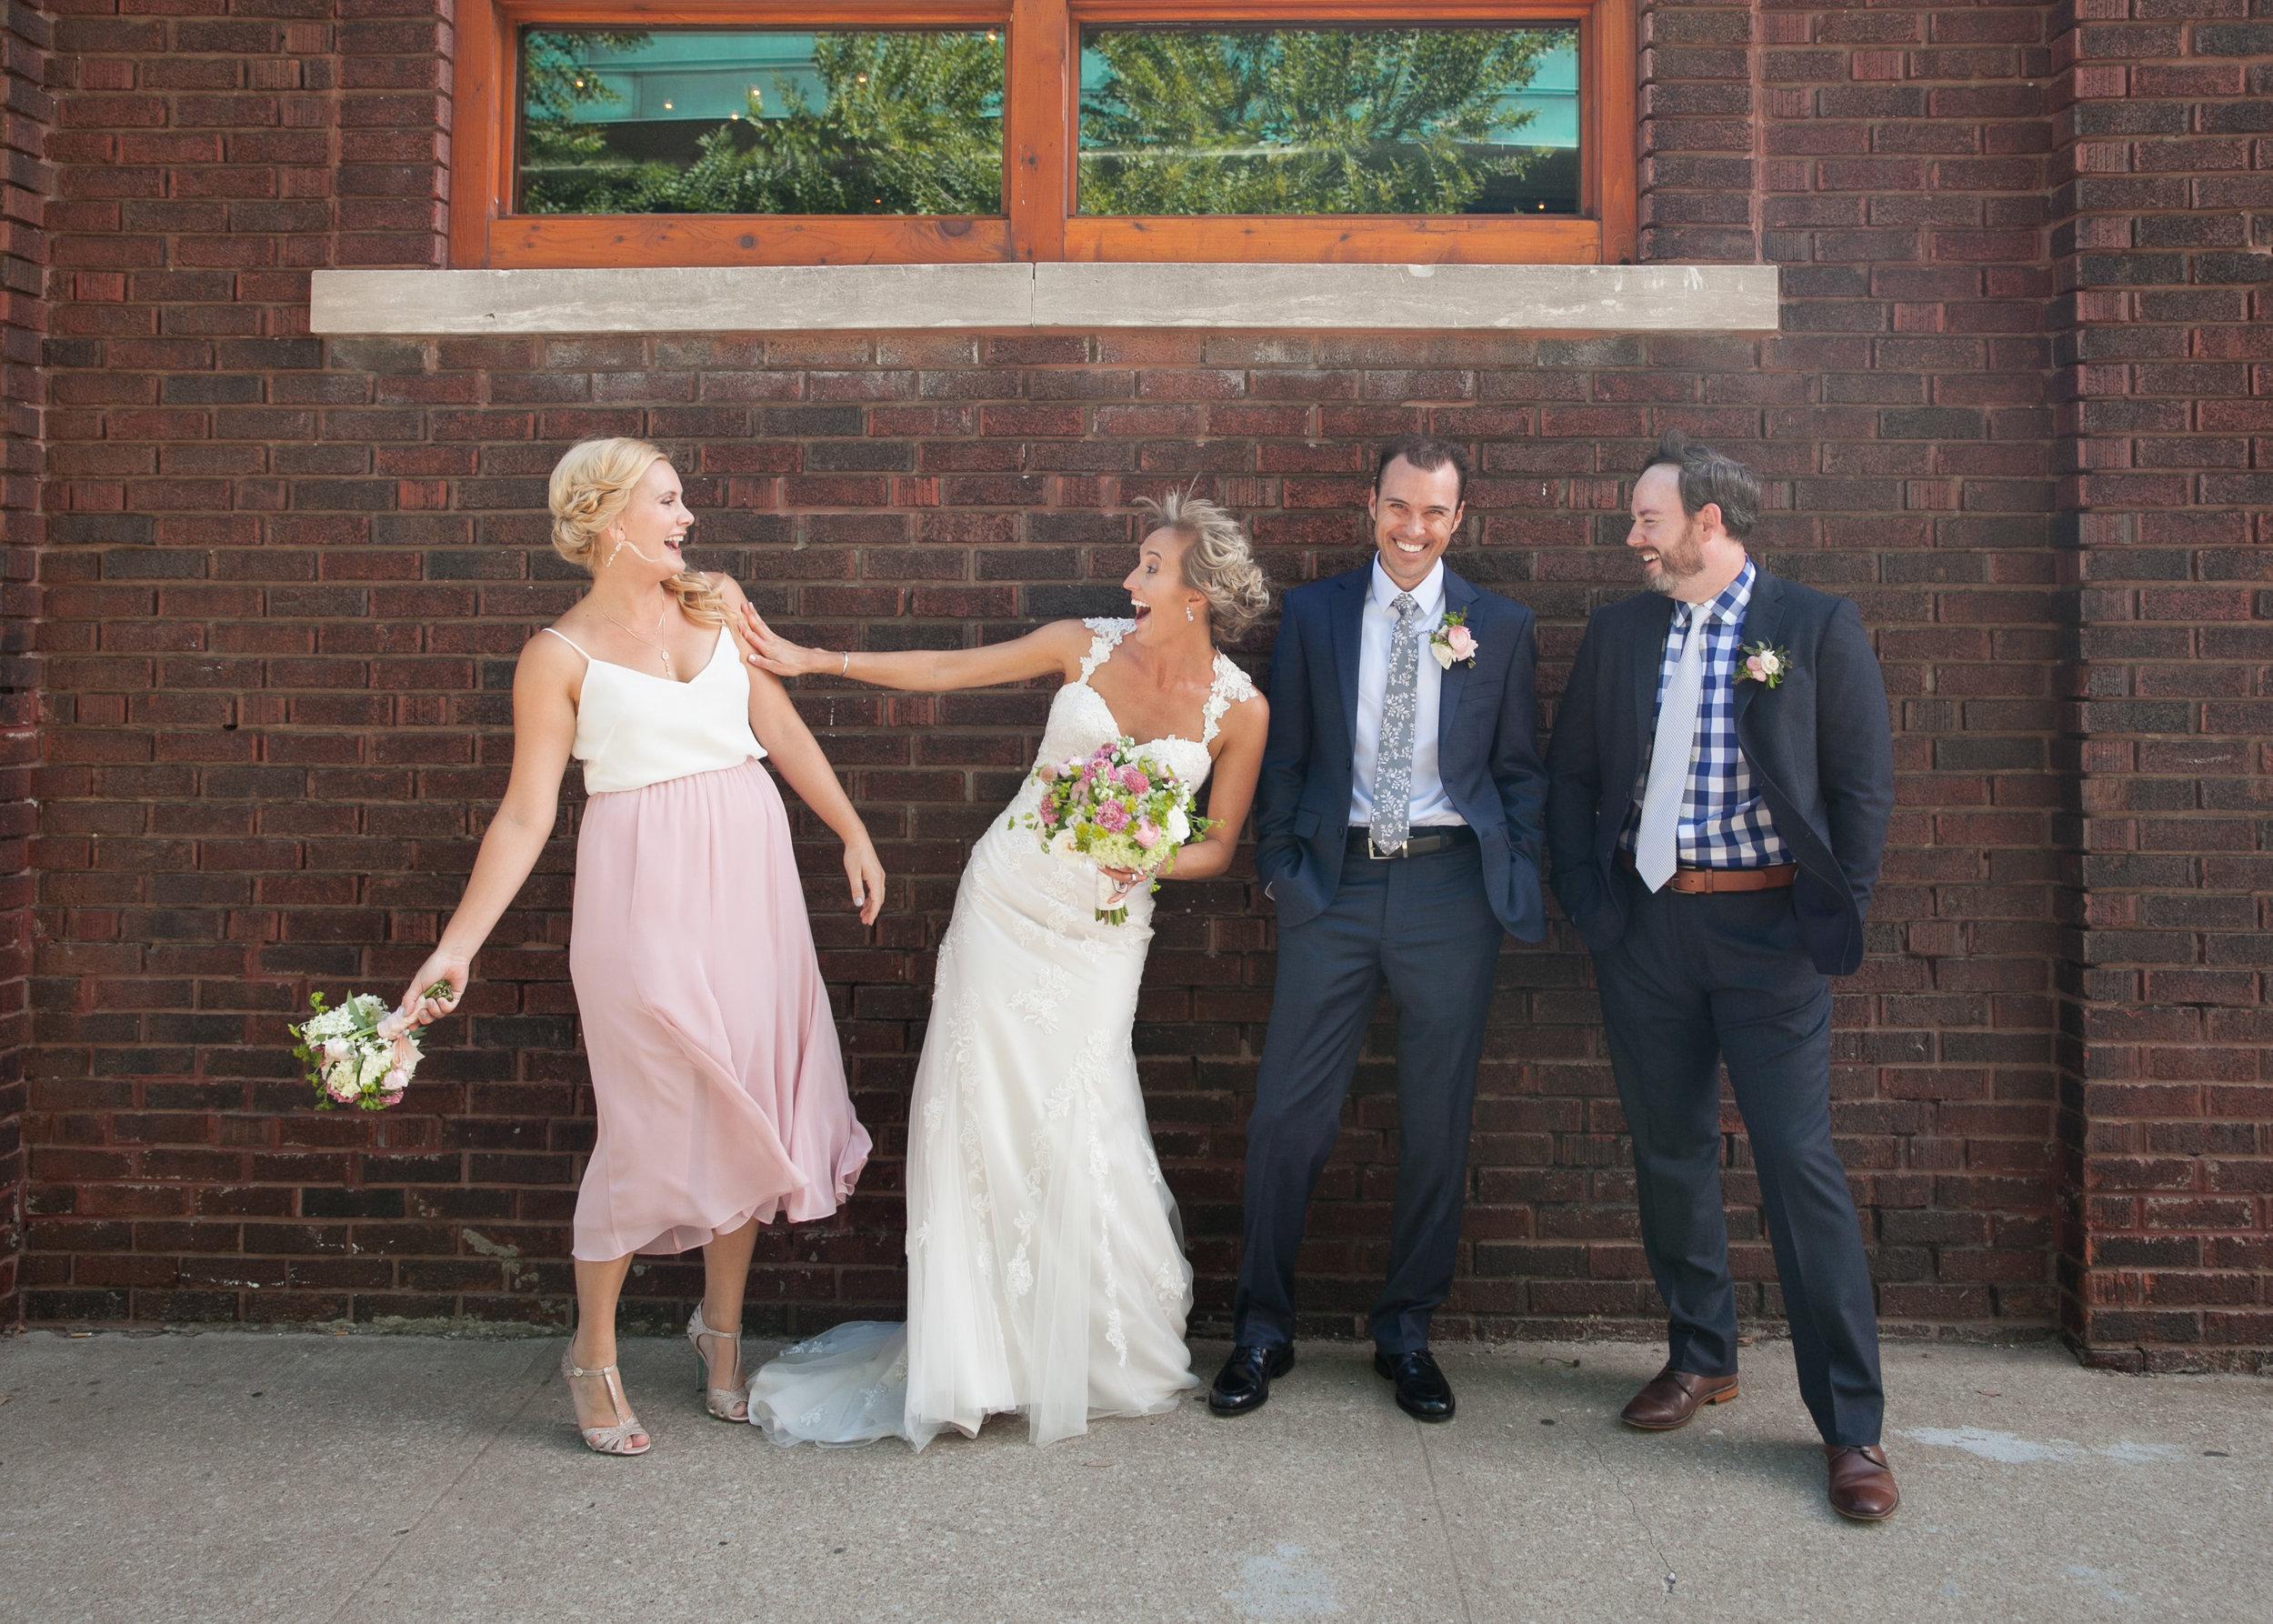 Kansas+City_Small+Wedding_Elope_Intimate_Ceremony_Best+Friends_7.jpg